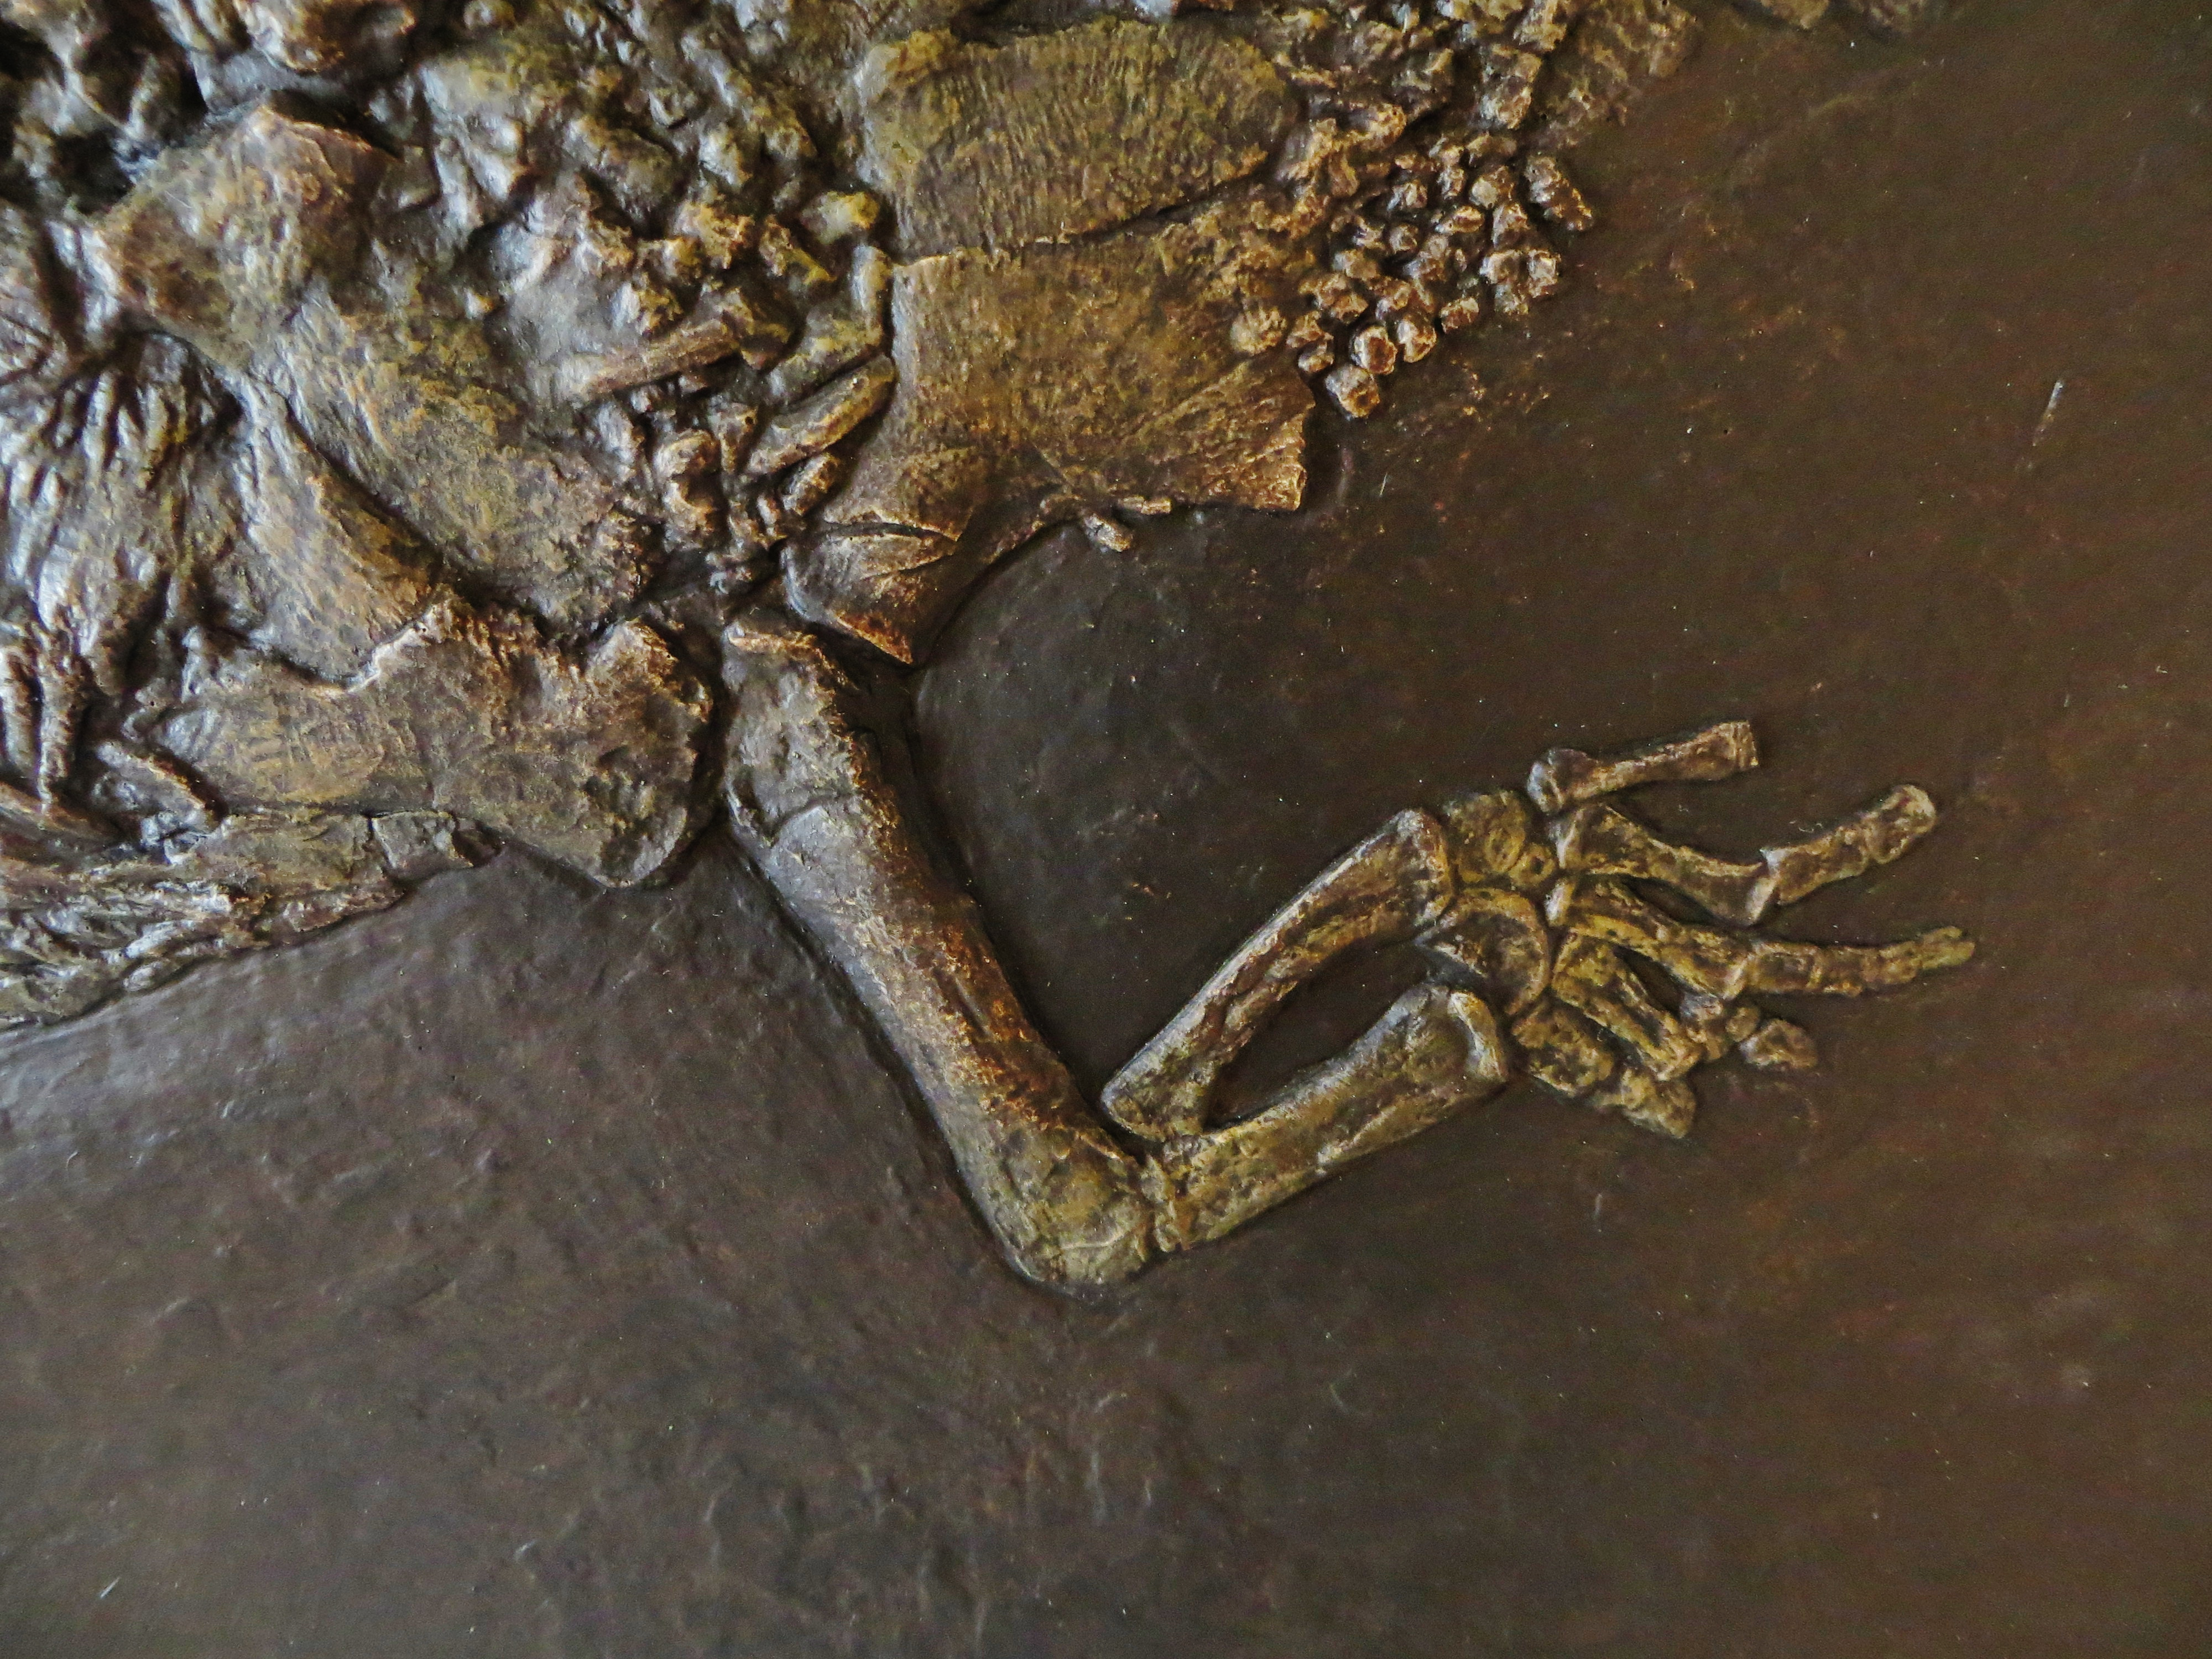 filelariosaurus balsami 343456jpg